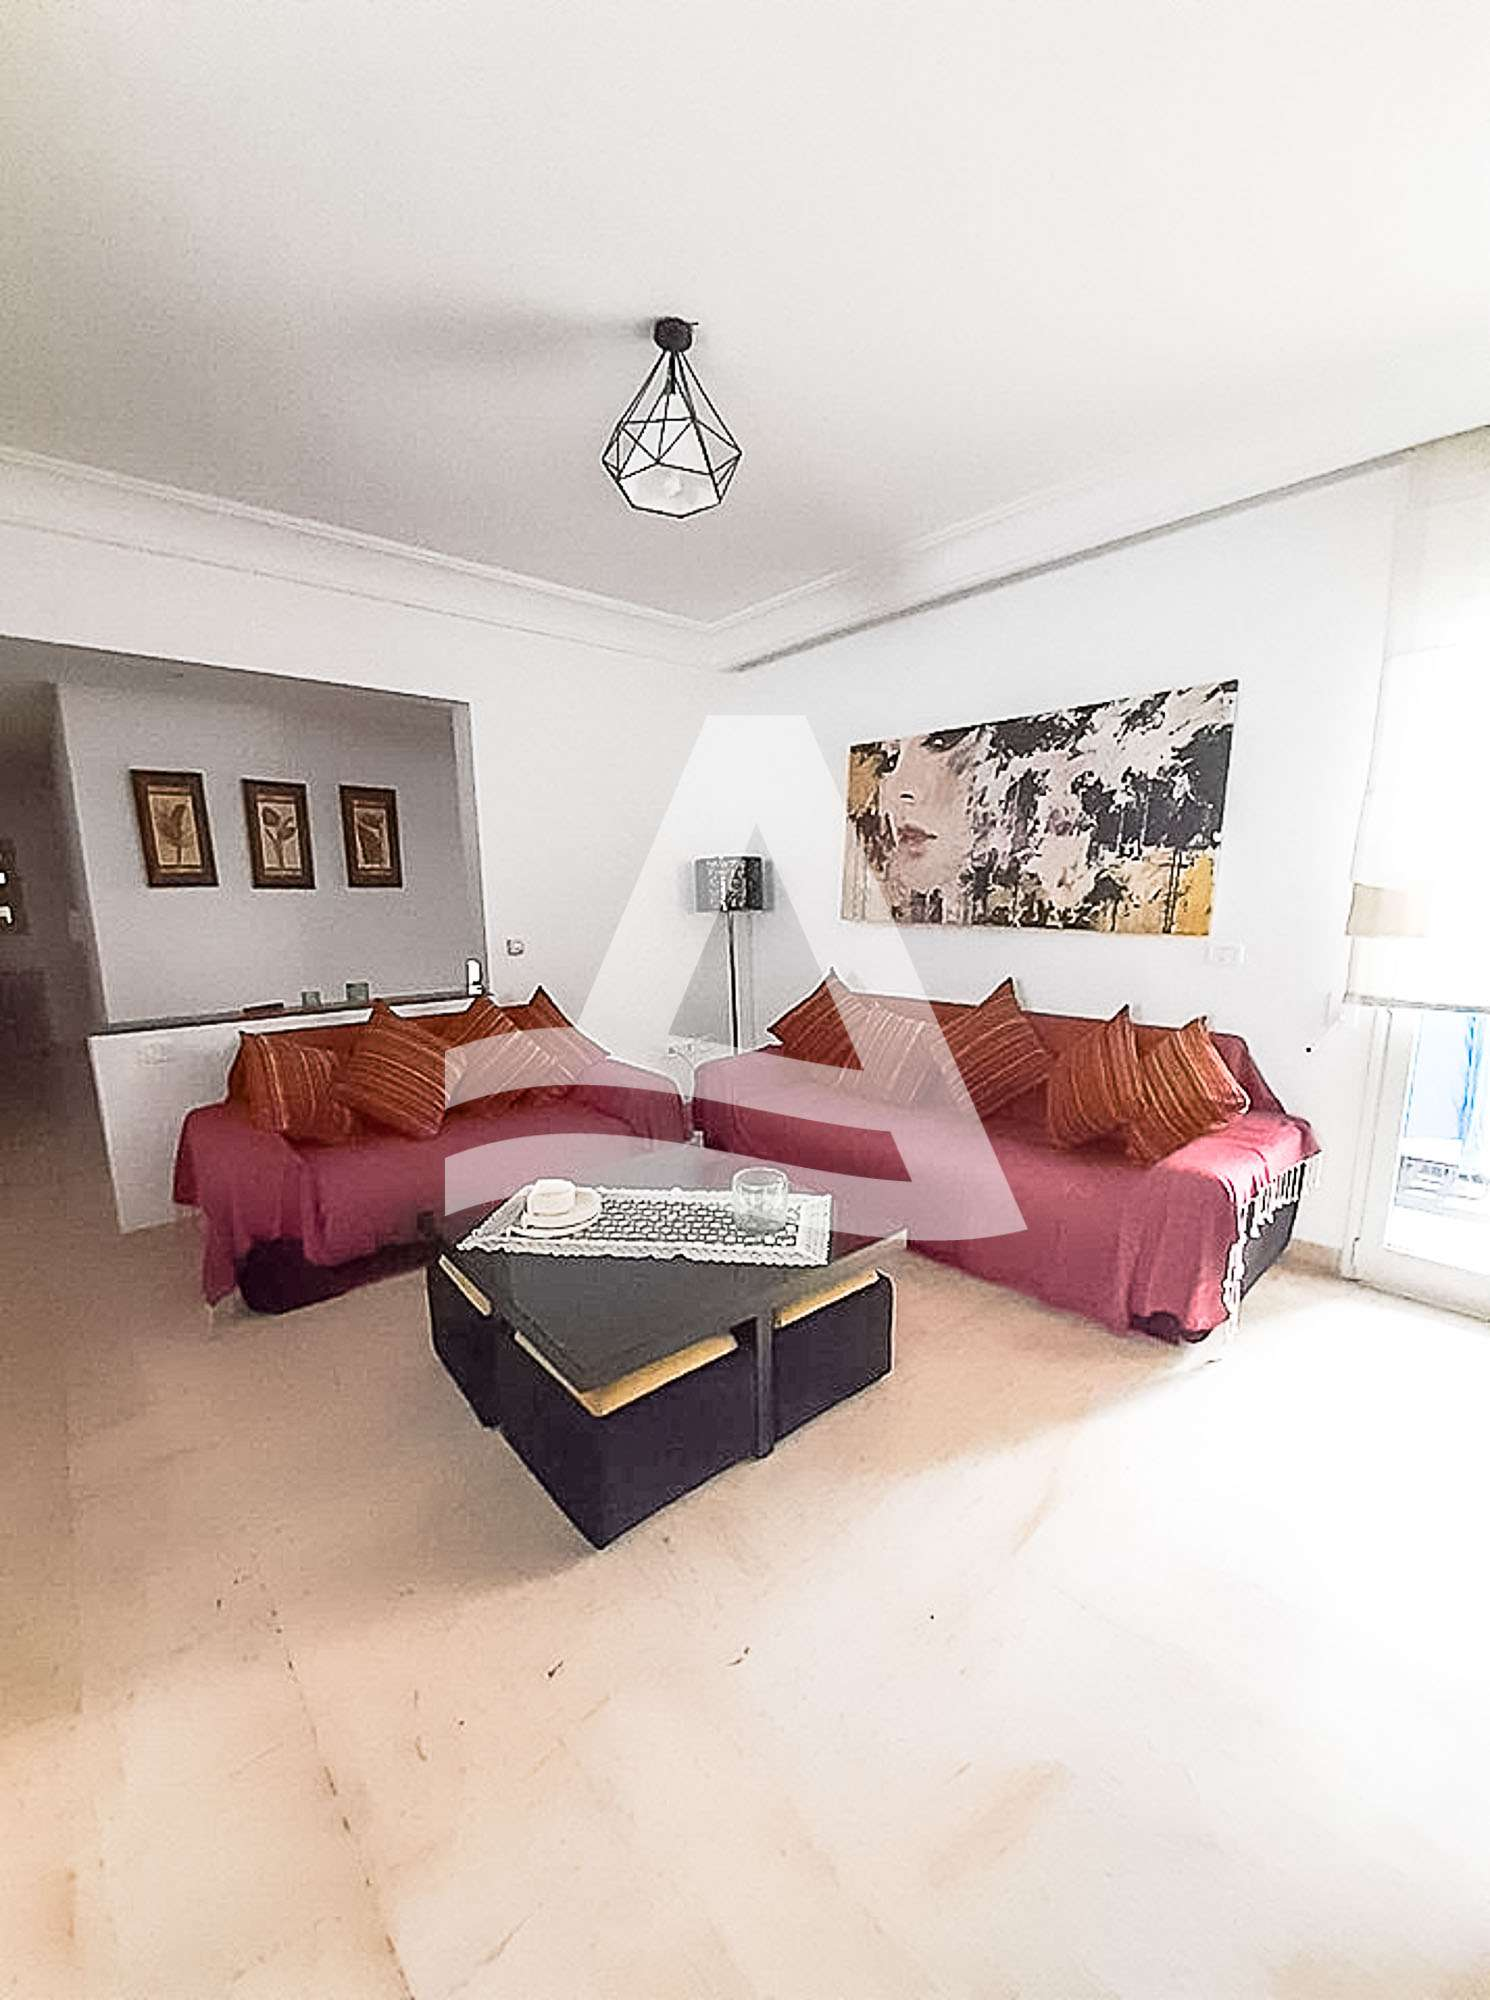 httpss3.amazonaws.comlogimoaws_Arcane_immobilière_la_Marsa-_location_-_vente_la_marsa_3_sur_16_1574071698407-1